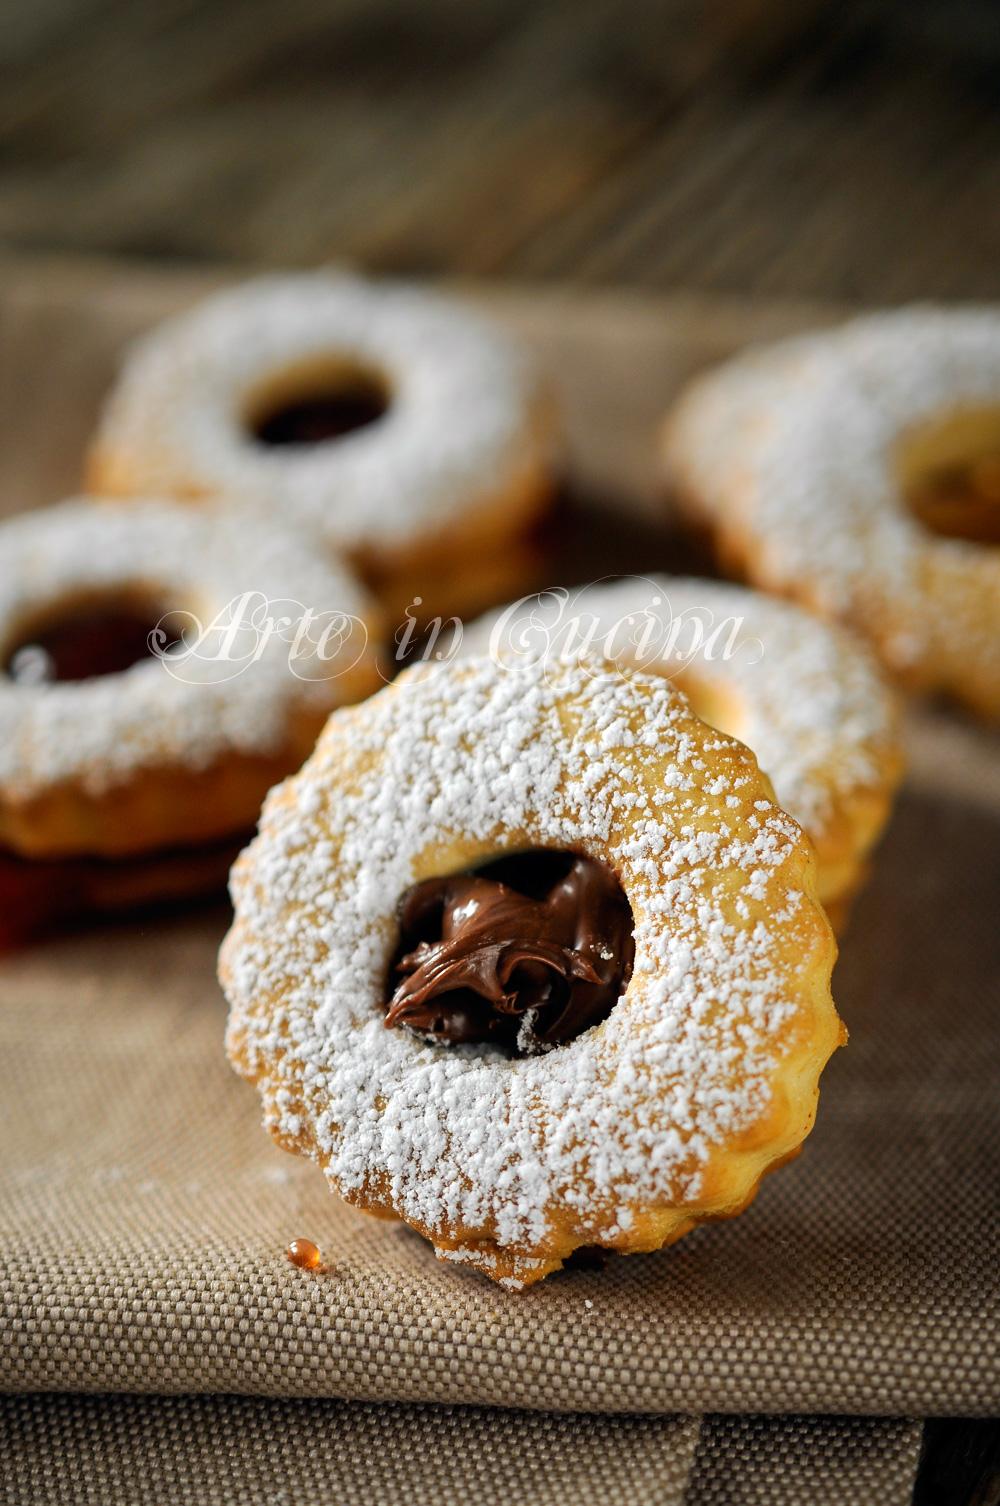 Biscotti senza uova burro e zucchero ricetta veloce vickyart arte in cucina